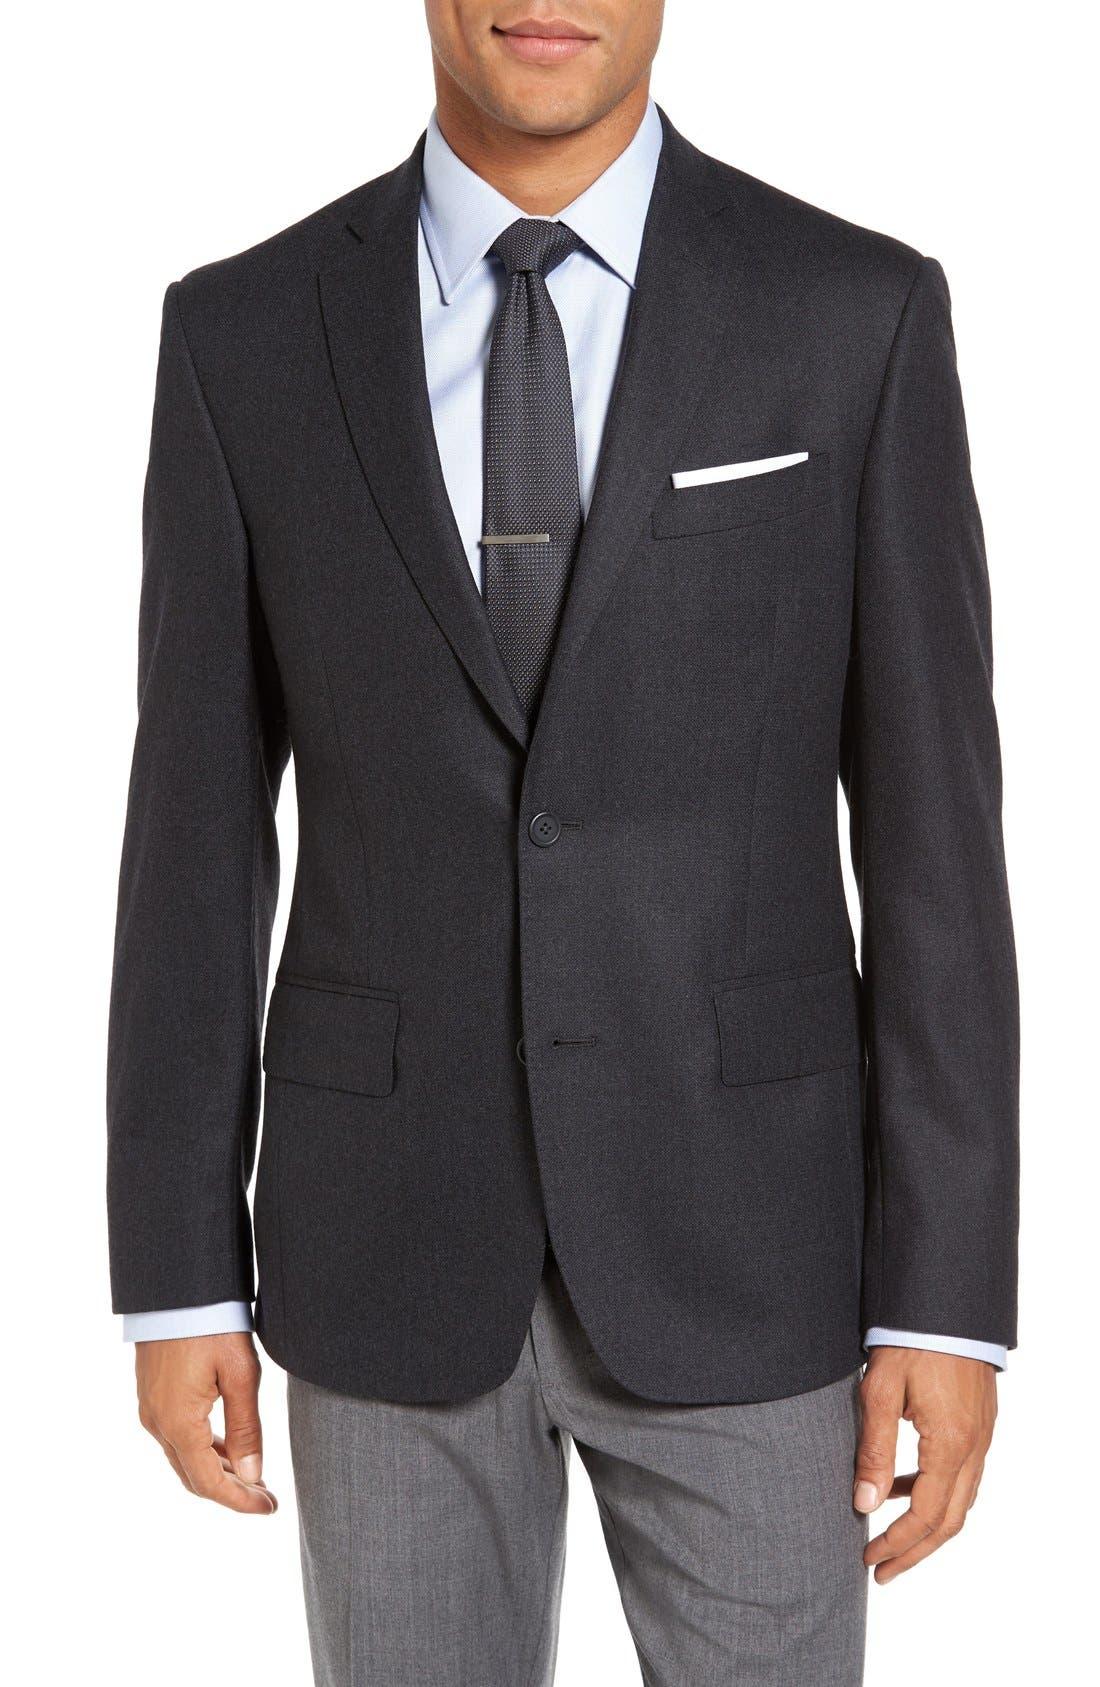 Nordstrom Men's Shop Classic Fit Wool & Cashmere Blazer